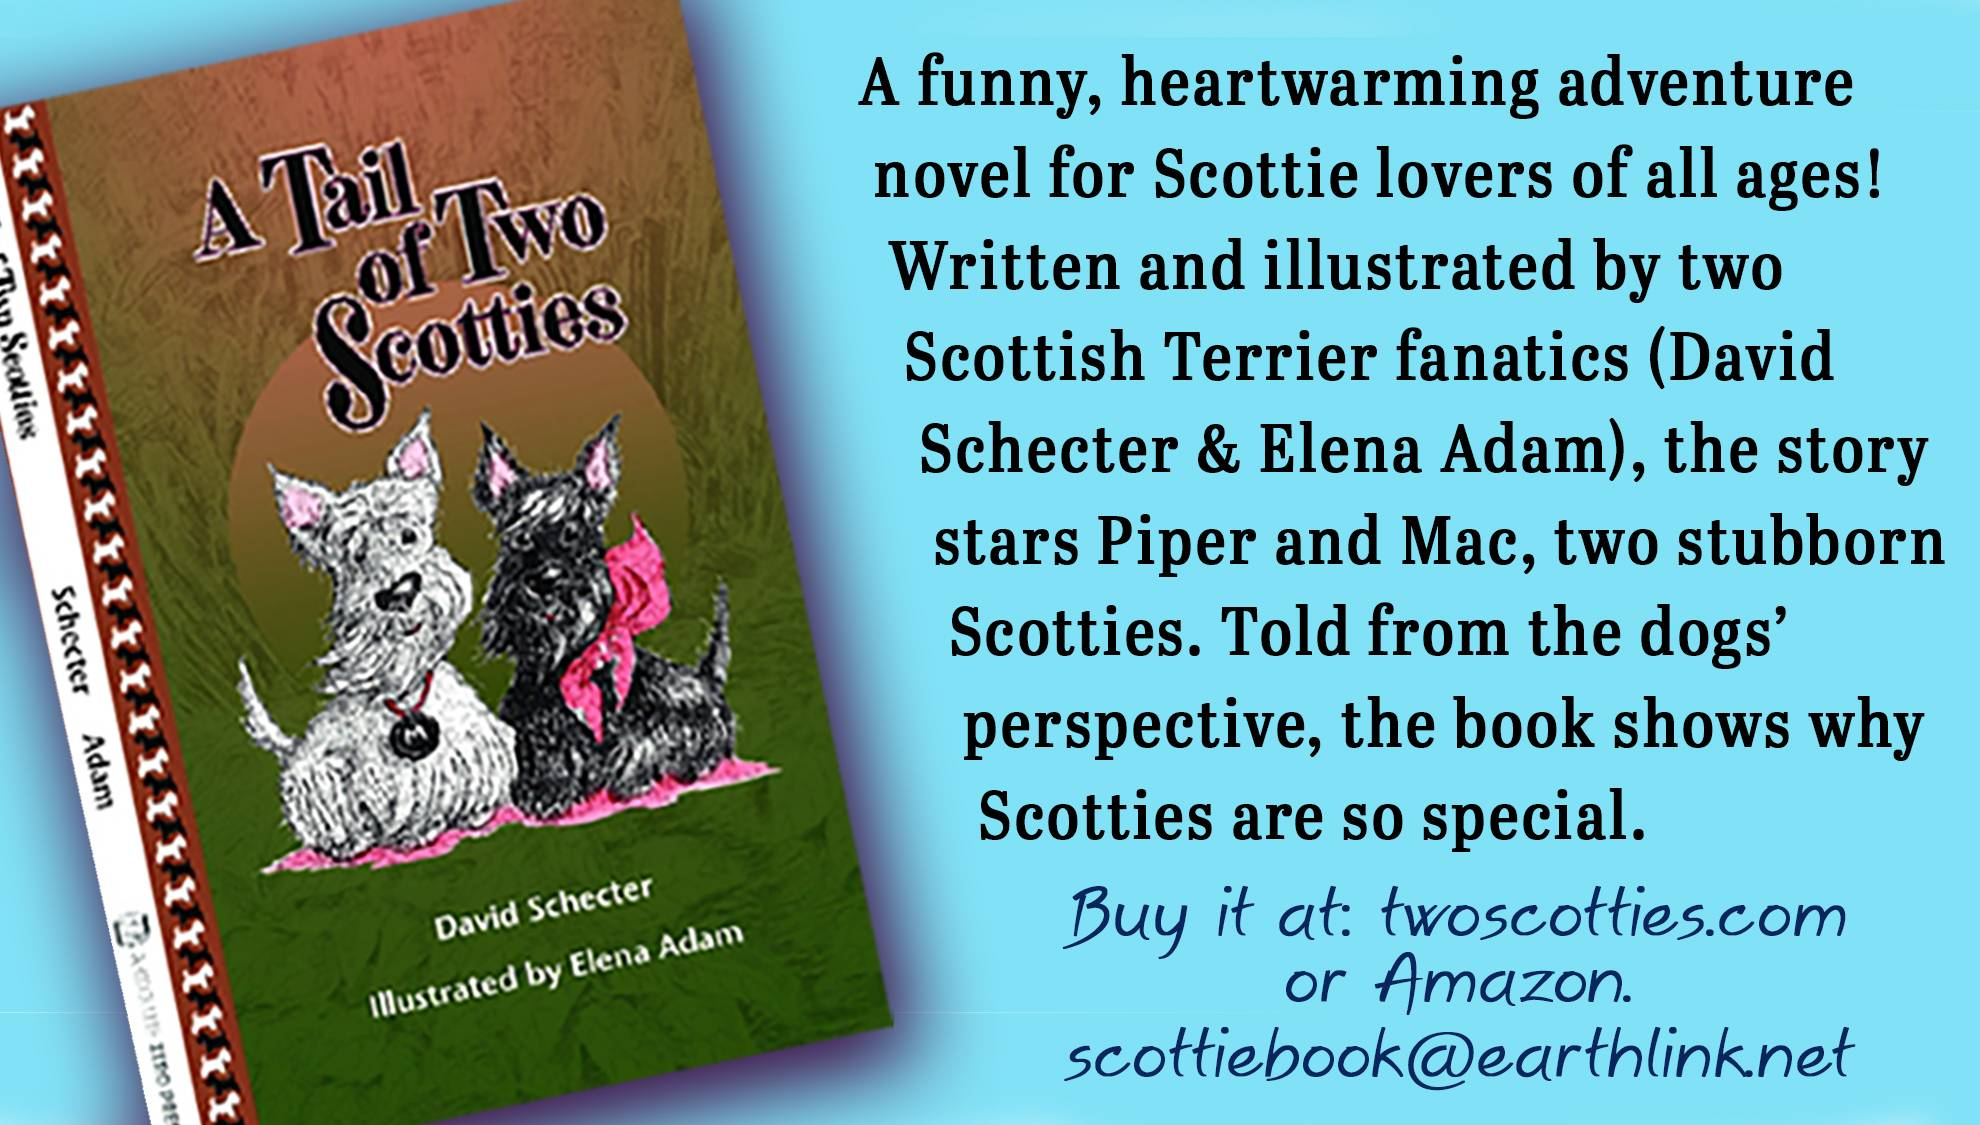 Two Scotties - An Adventure Book